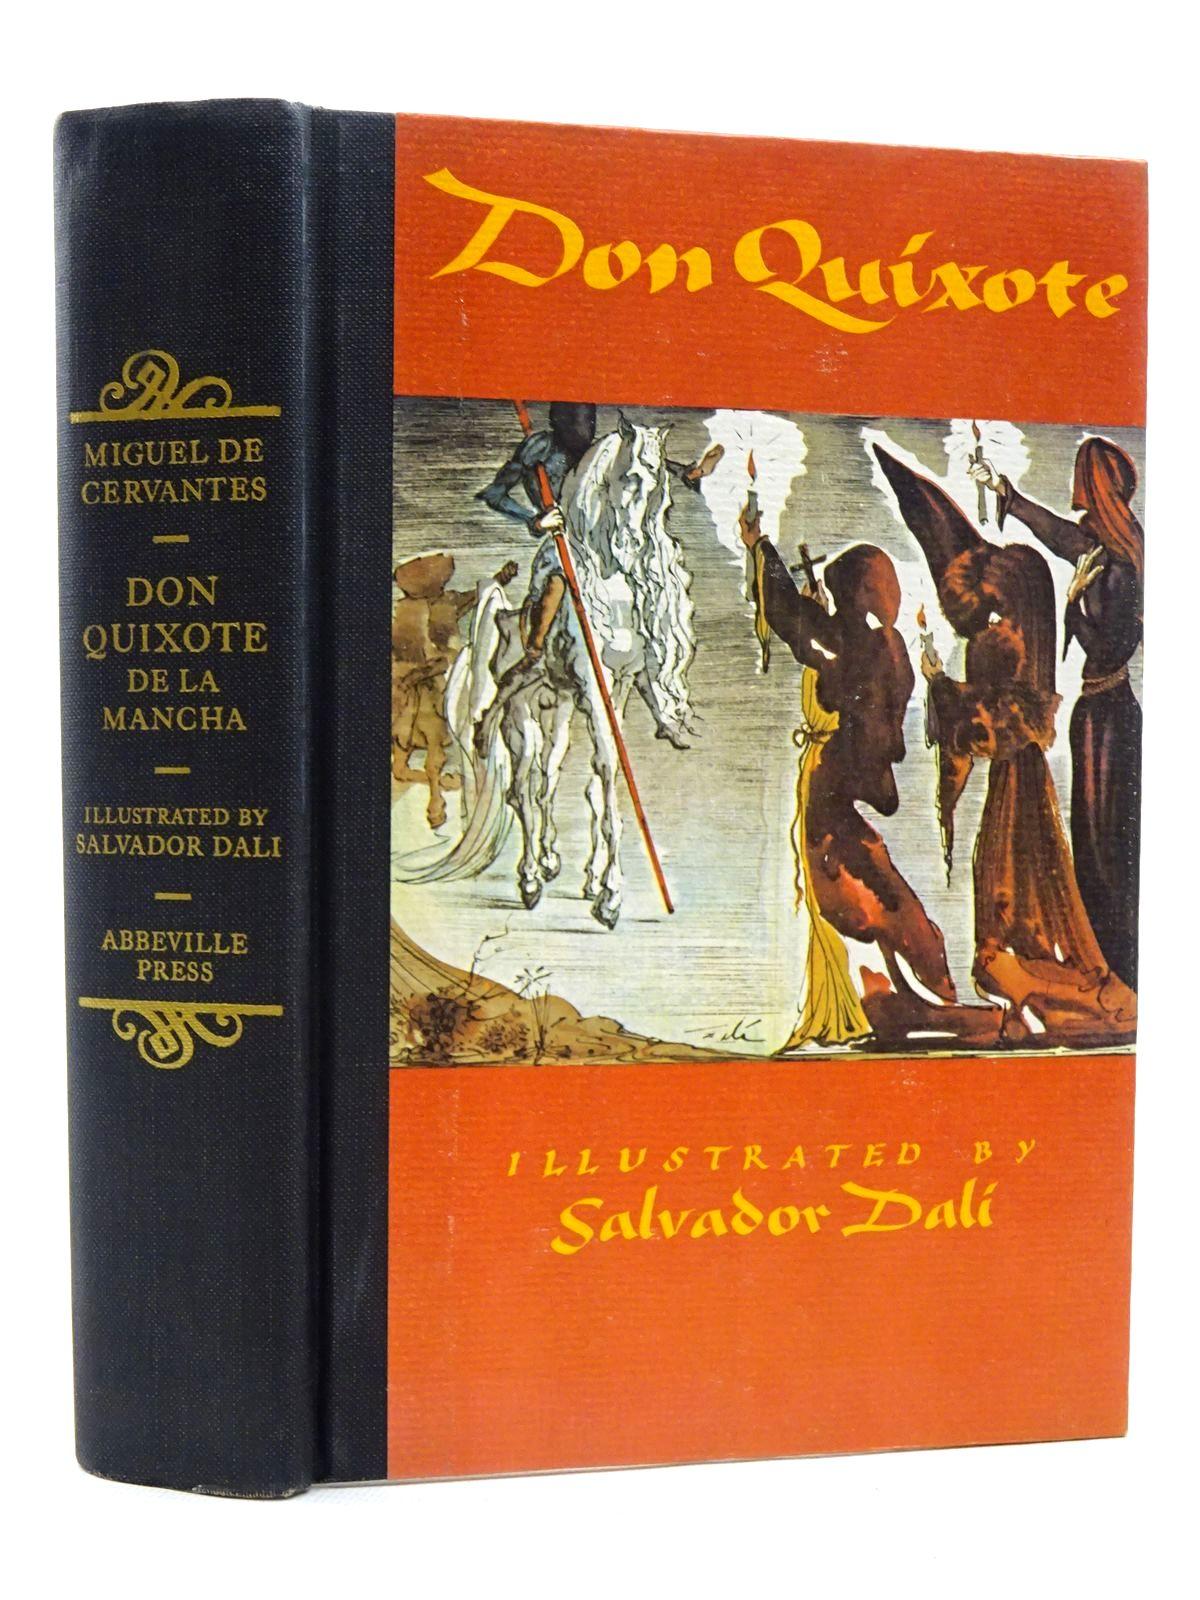 Photo of DON QUIXOTE DE LA MANCHA written by De Cervantes, Miguel illustrated by Dali, Salvador published by Abbeville Press (STOCK CODE: 1816047)  for sale by Stella & Rose's Books